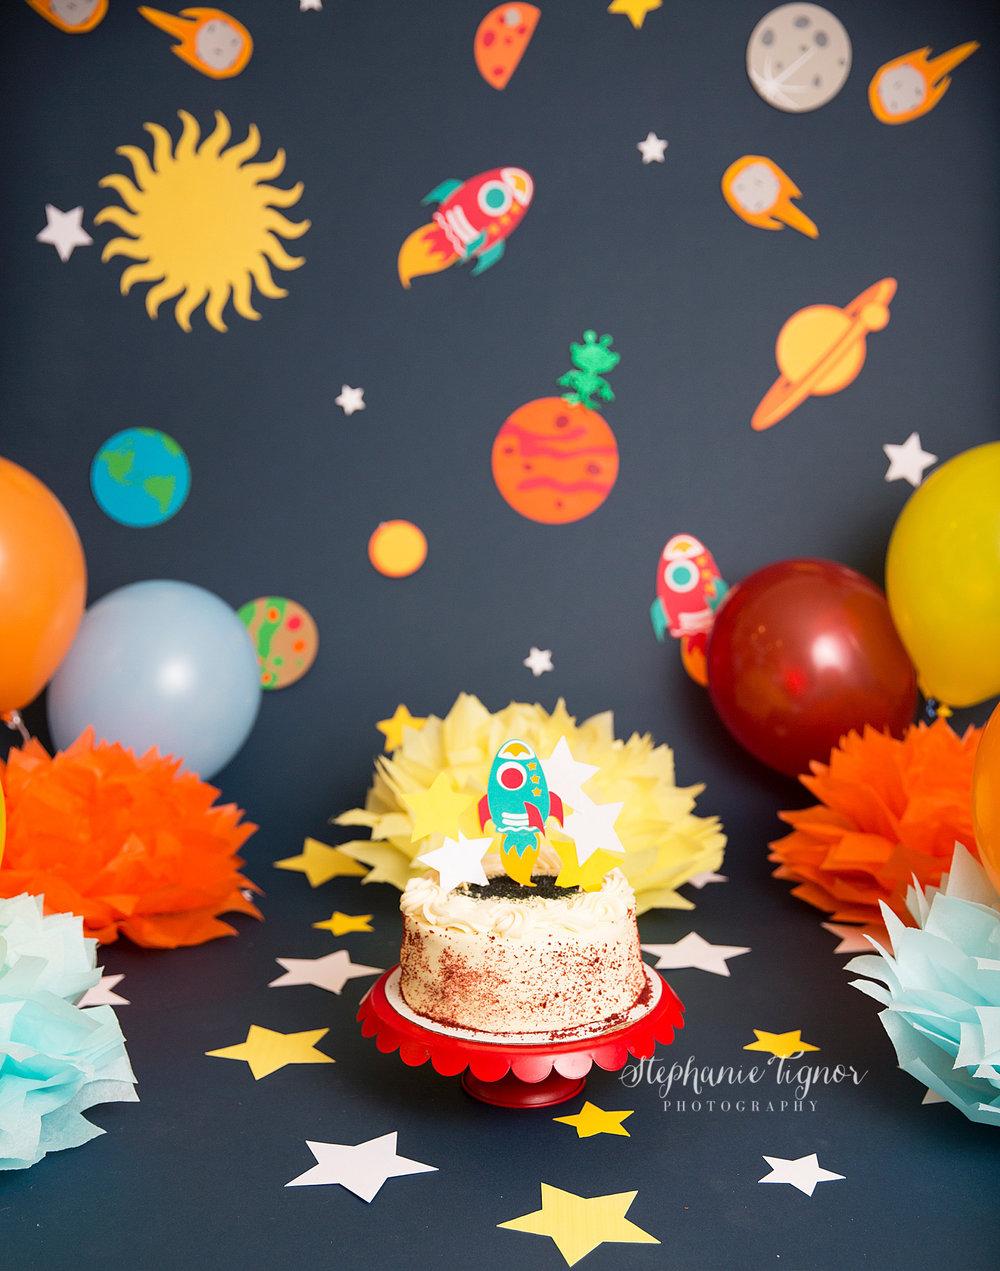 Stephanie Tignor Photography | Fredericksburg VA Cake Smash Photographer | Warrenton VA Cake Smash Photographer | Stafford VA Cake Smash Photographer | Cake Smash Photographer | Space Themed Cake Smash